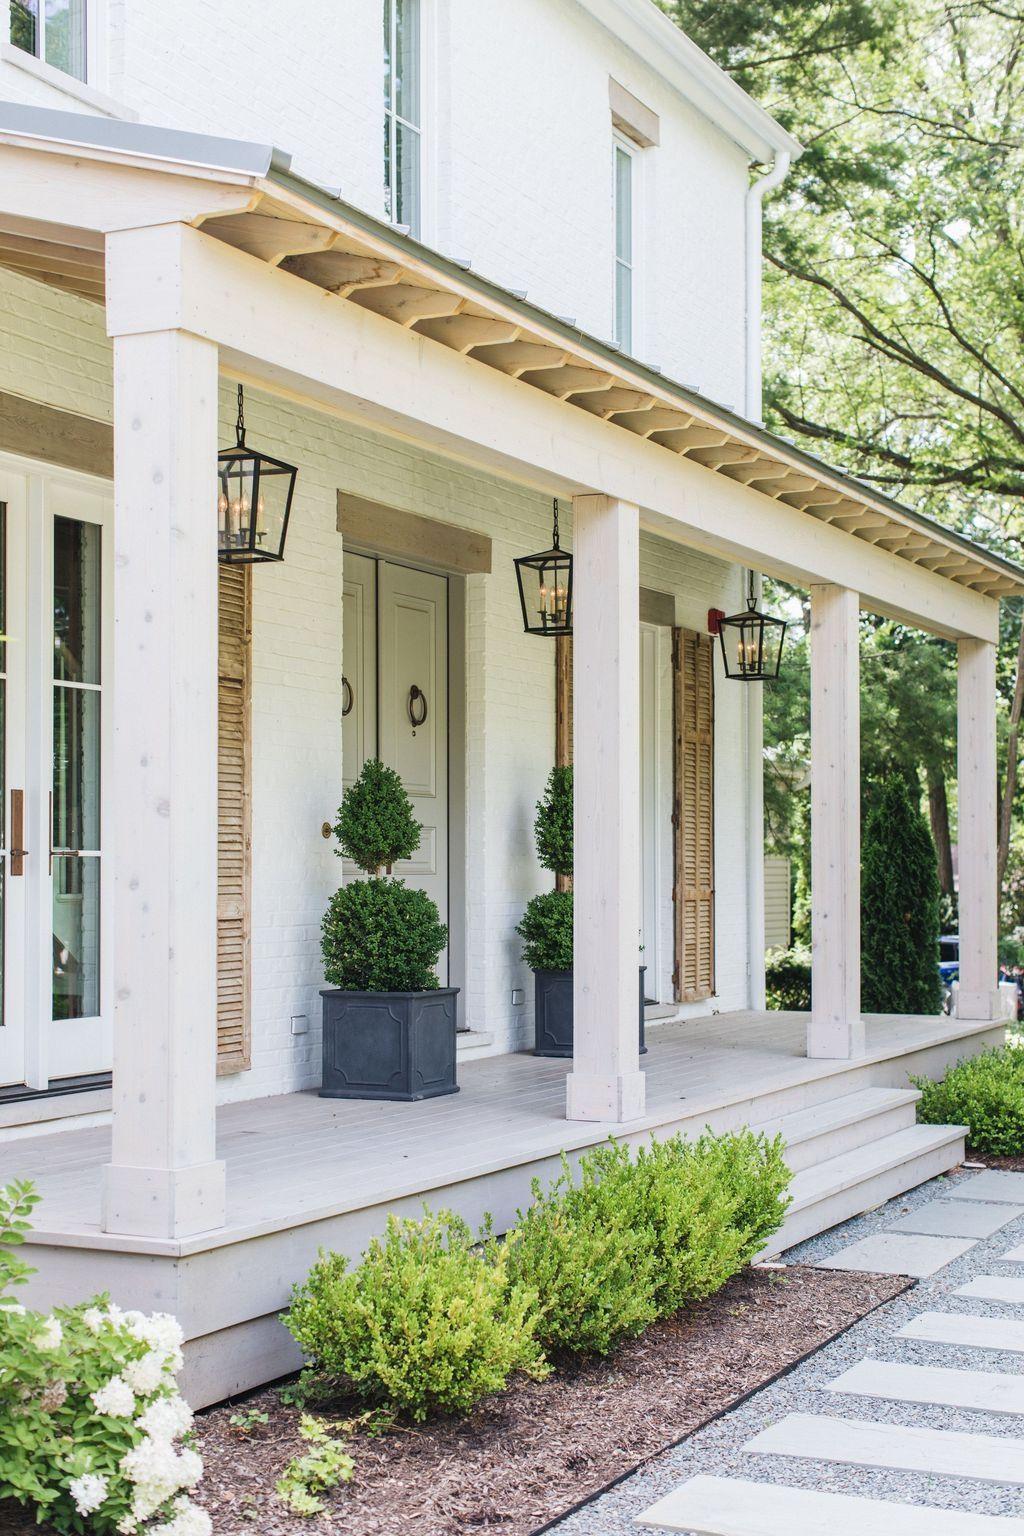 20 Brilliant Rustic Farmhouse Porch Decor Ideas Trendhmdcr Porch Design House Exterior Front Porch Design